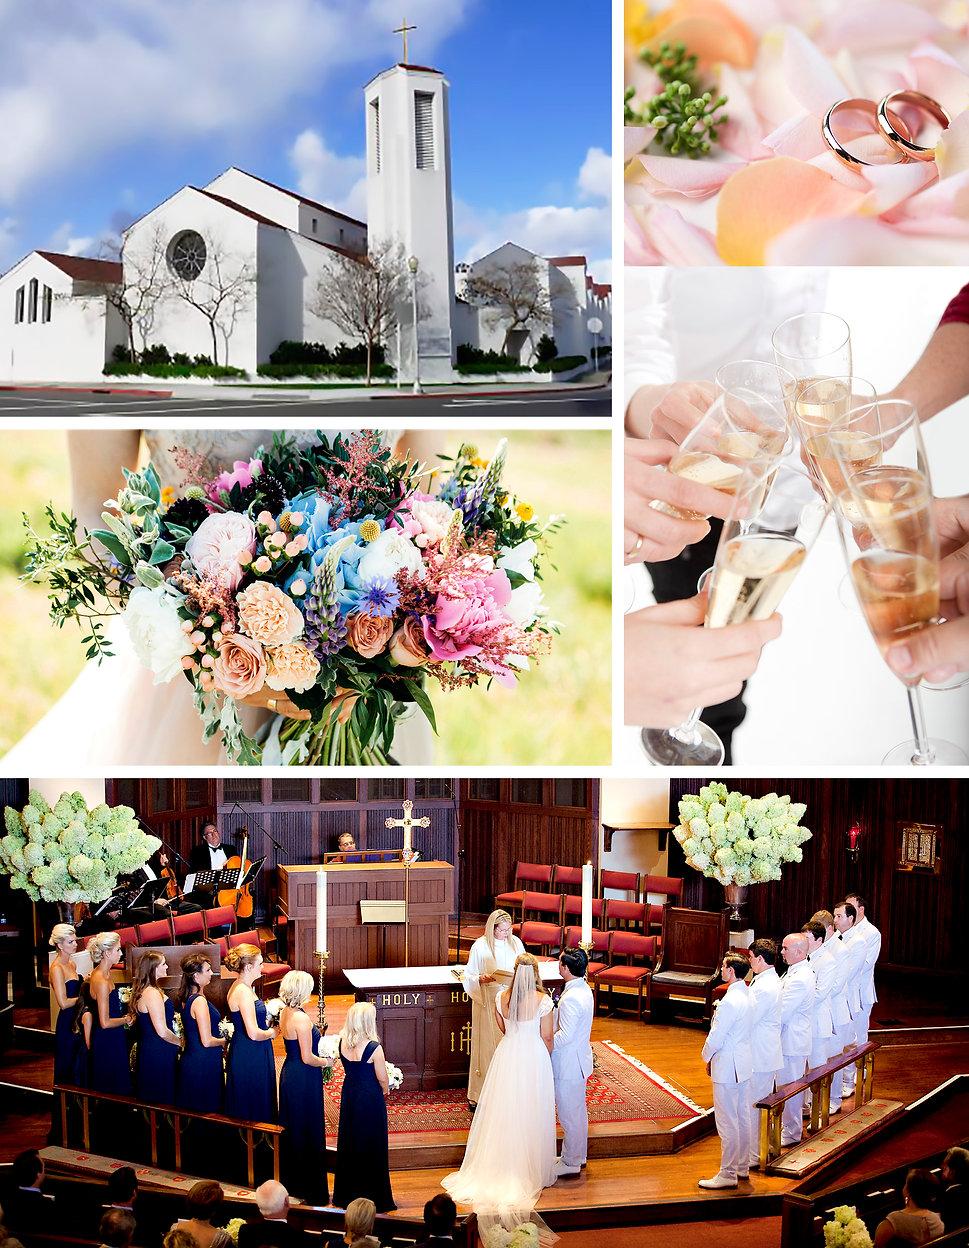 Wedding_montage.jpg